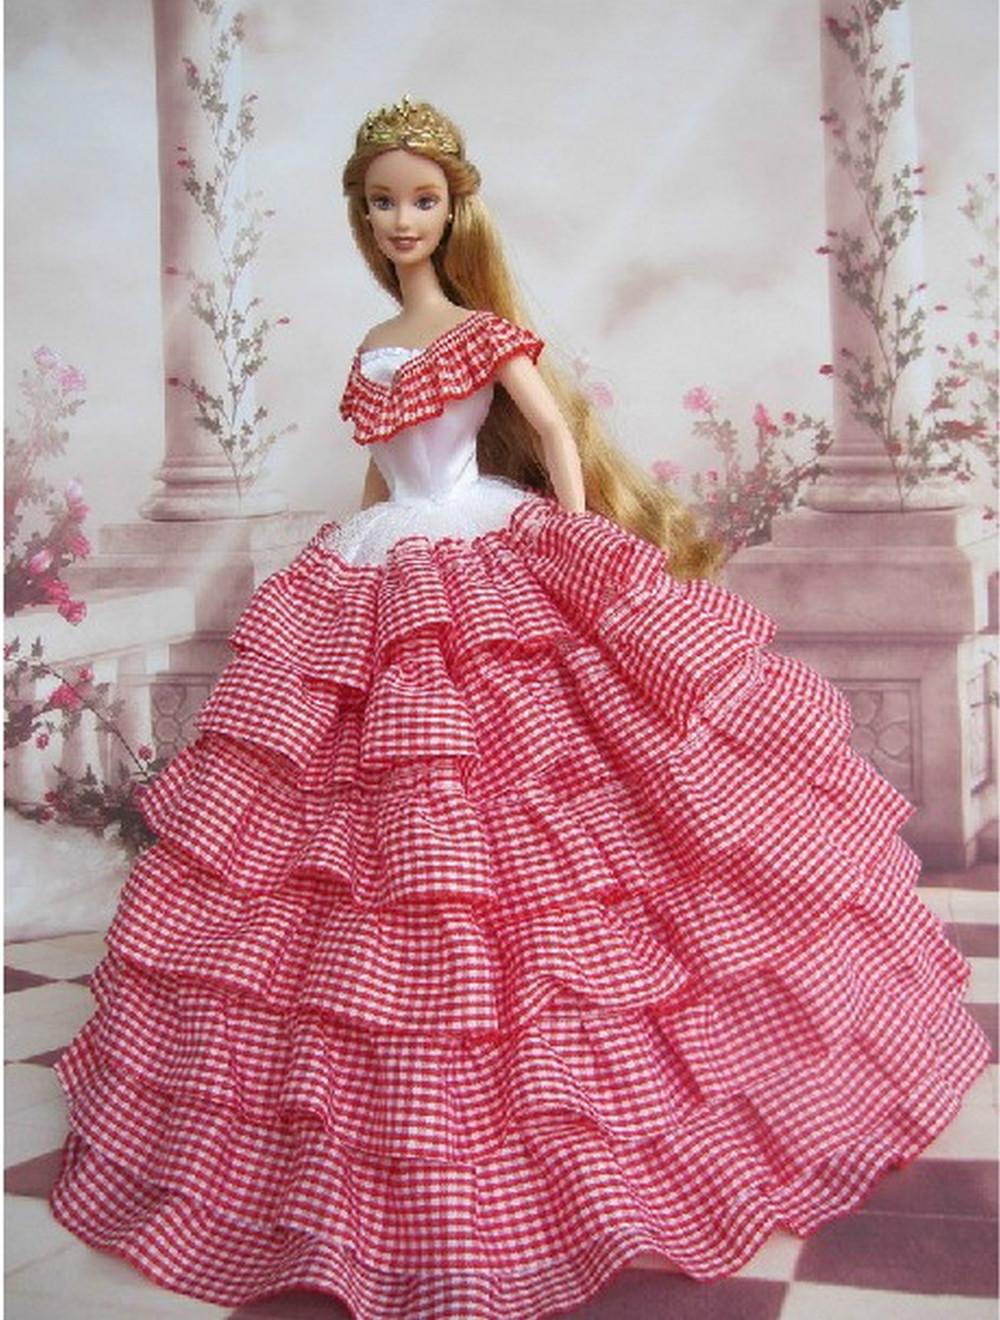 Compare Barbie Accessories Source Barbie Accessories by Comparing